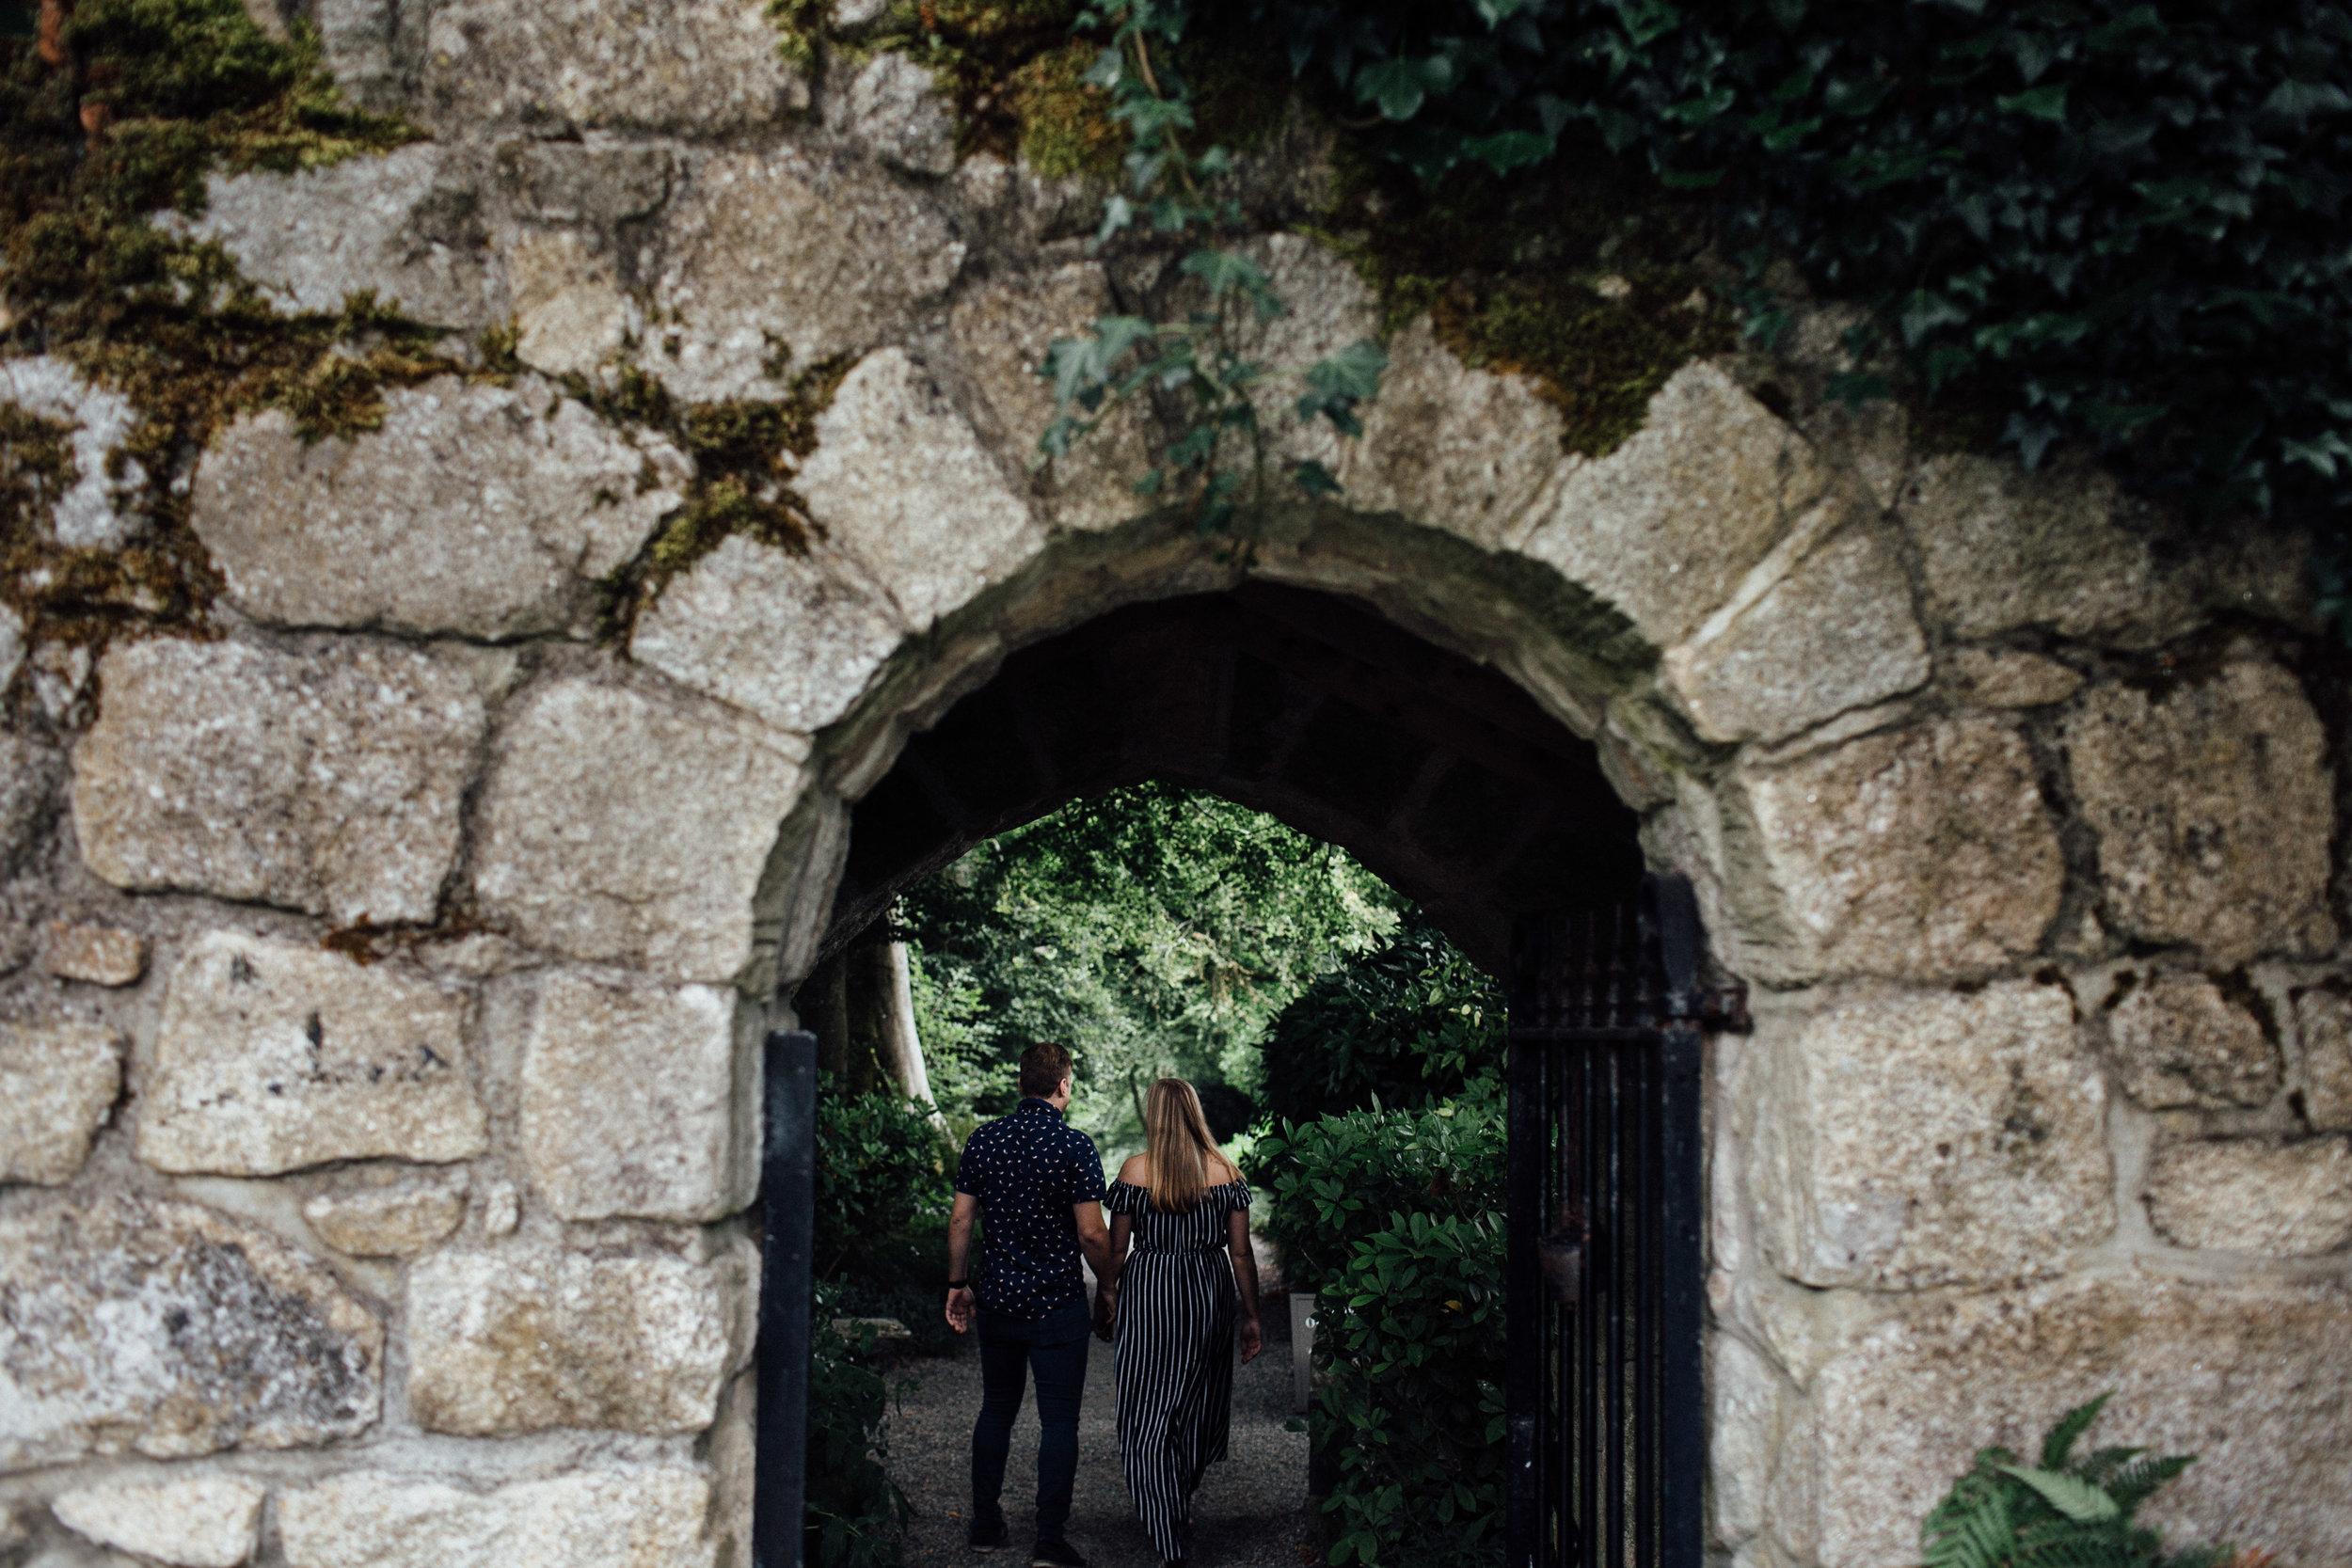 ireland_county_wicklow_glendalough_engagement_adventure_photography_windy_moody_atlanta_wedding_photographer_1001.jpg